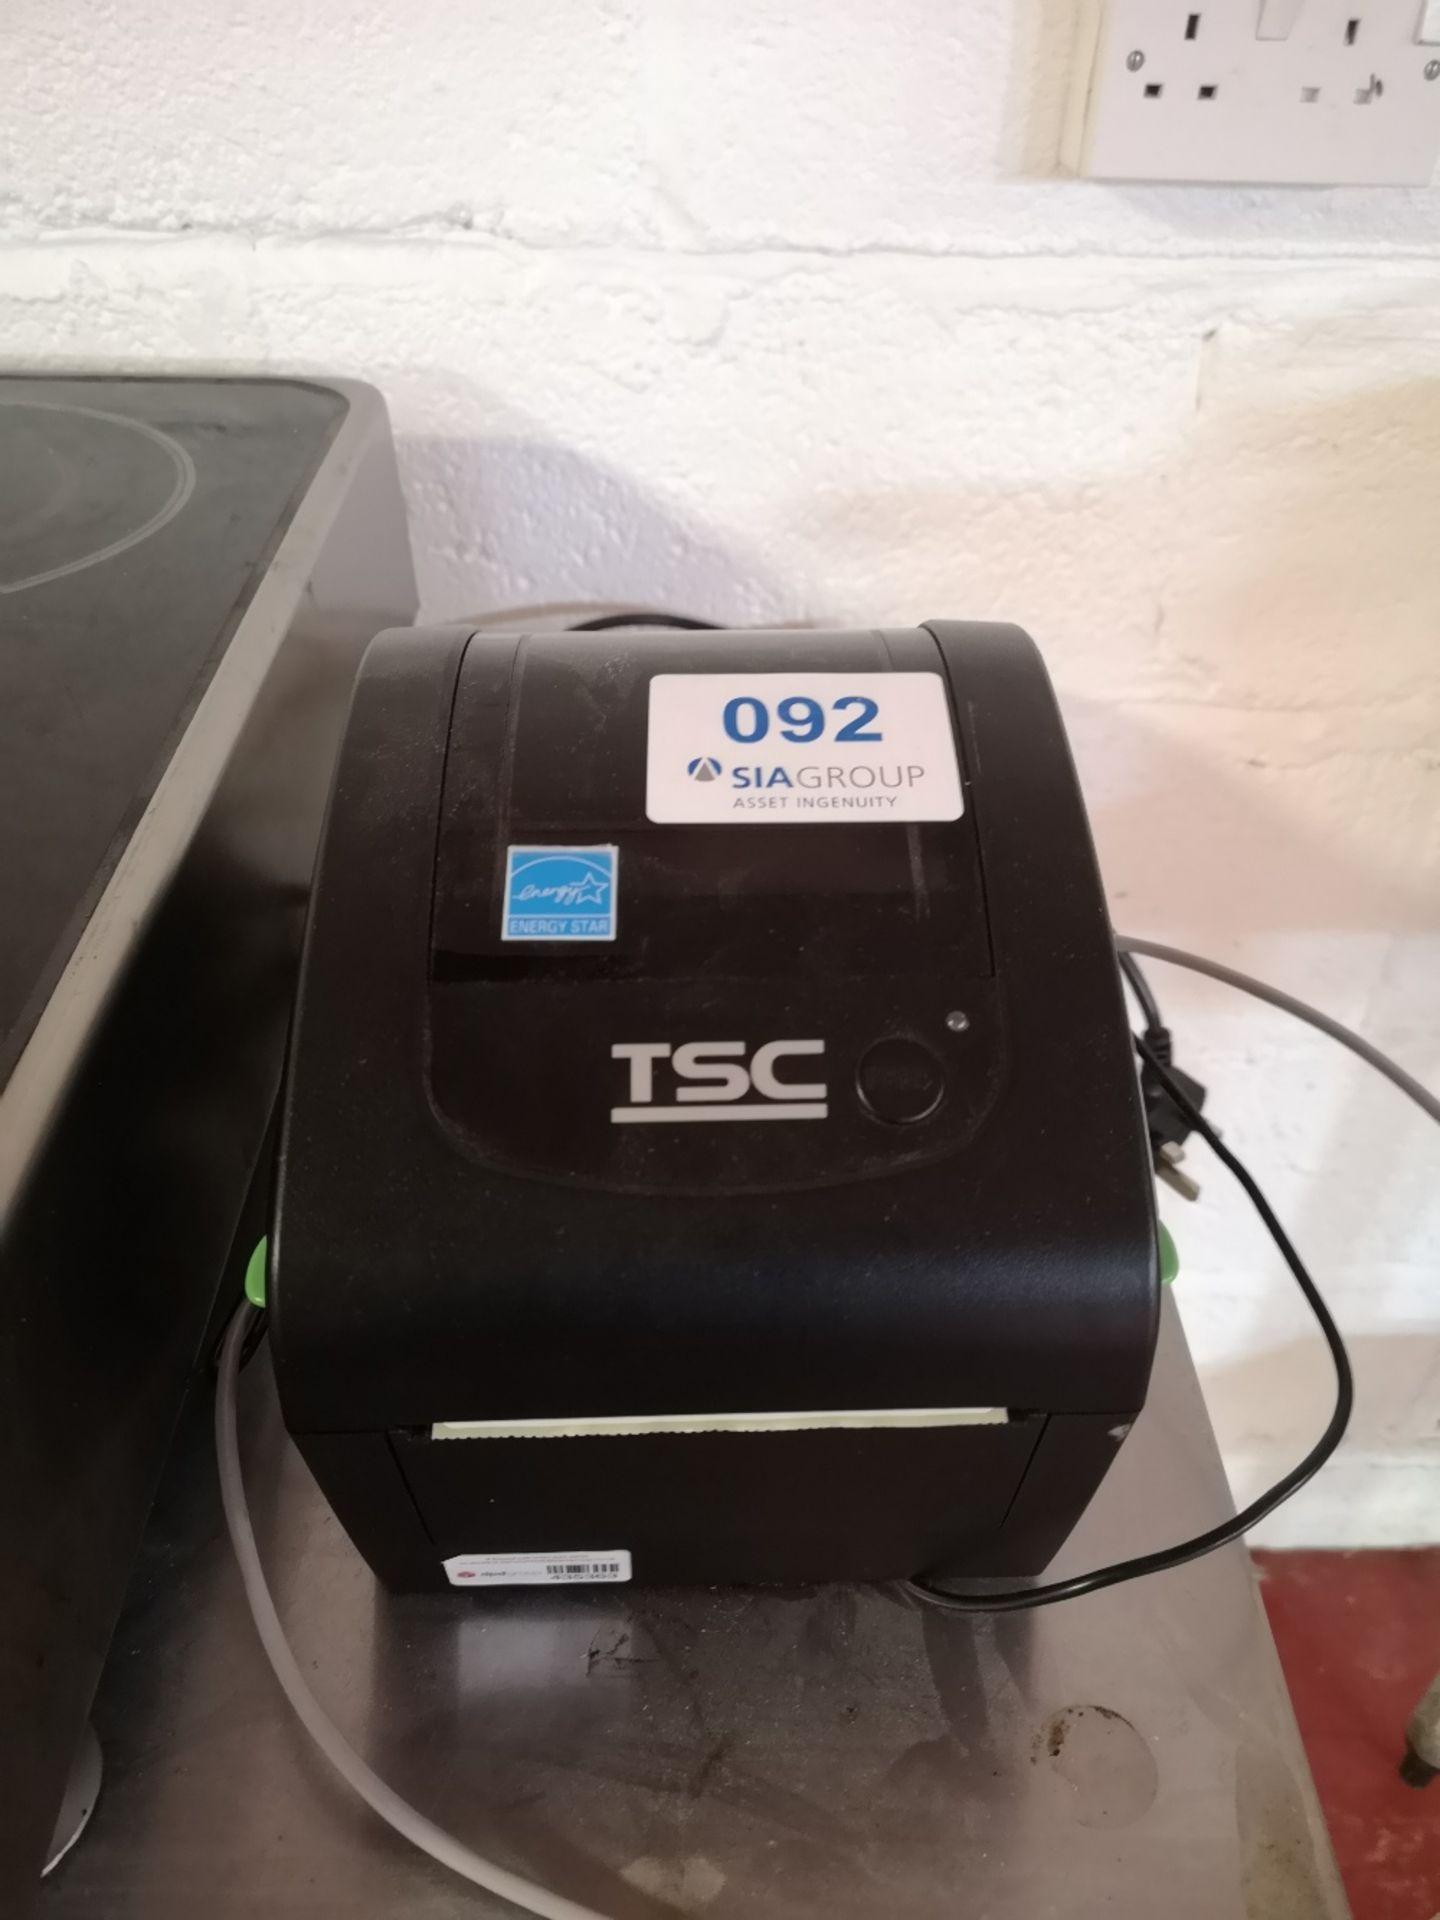 TSC DA210 Thermal Label Printer